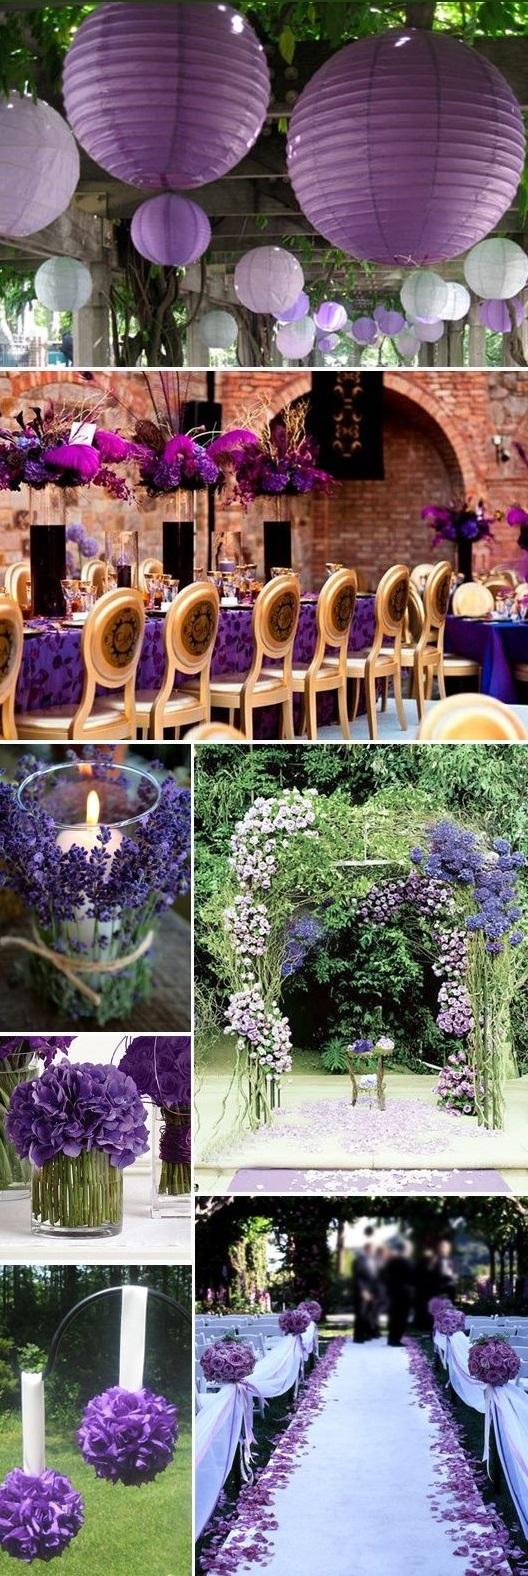 Fiolet kolorem ślubu i wesela 2014 3